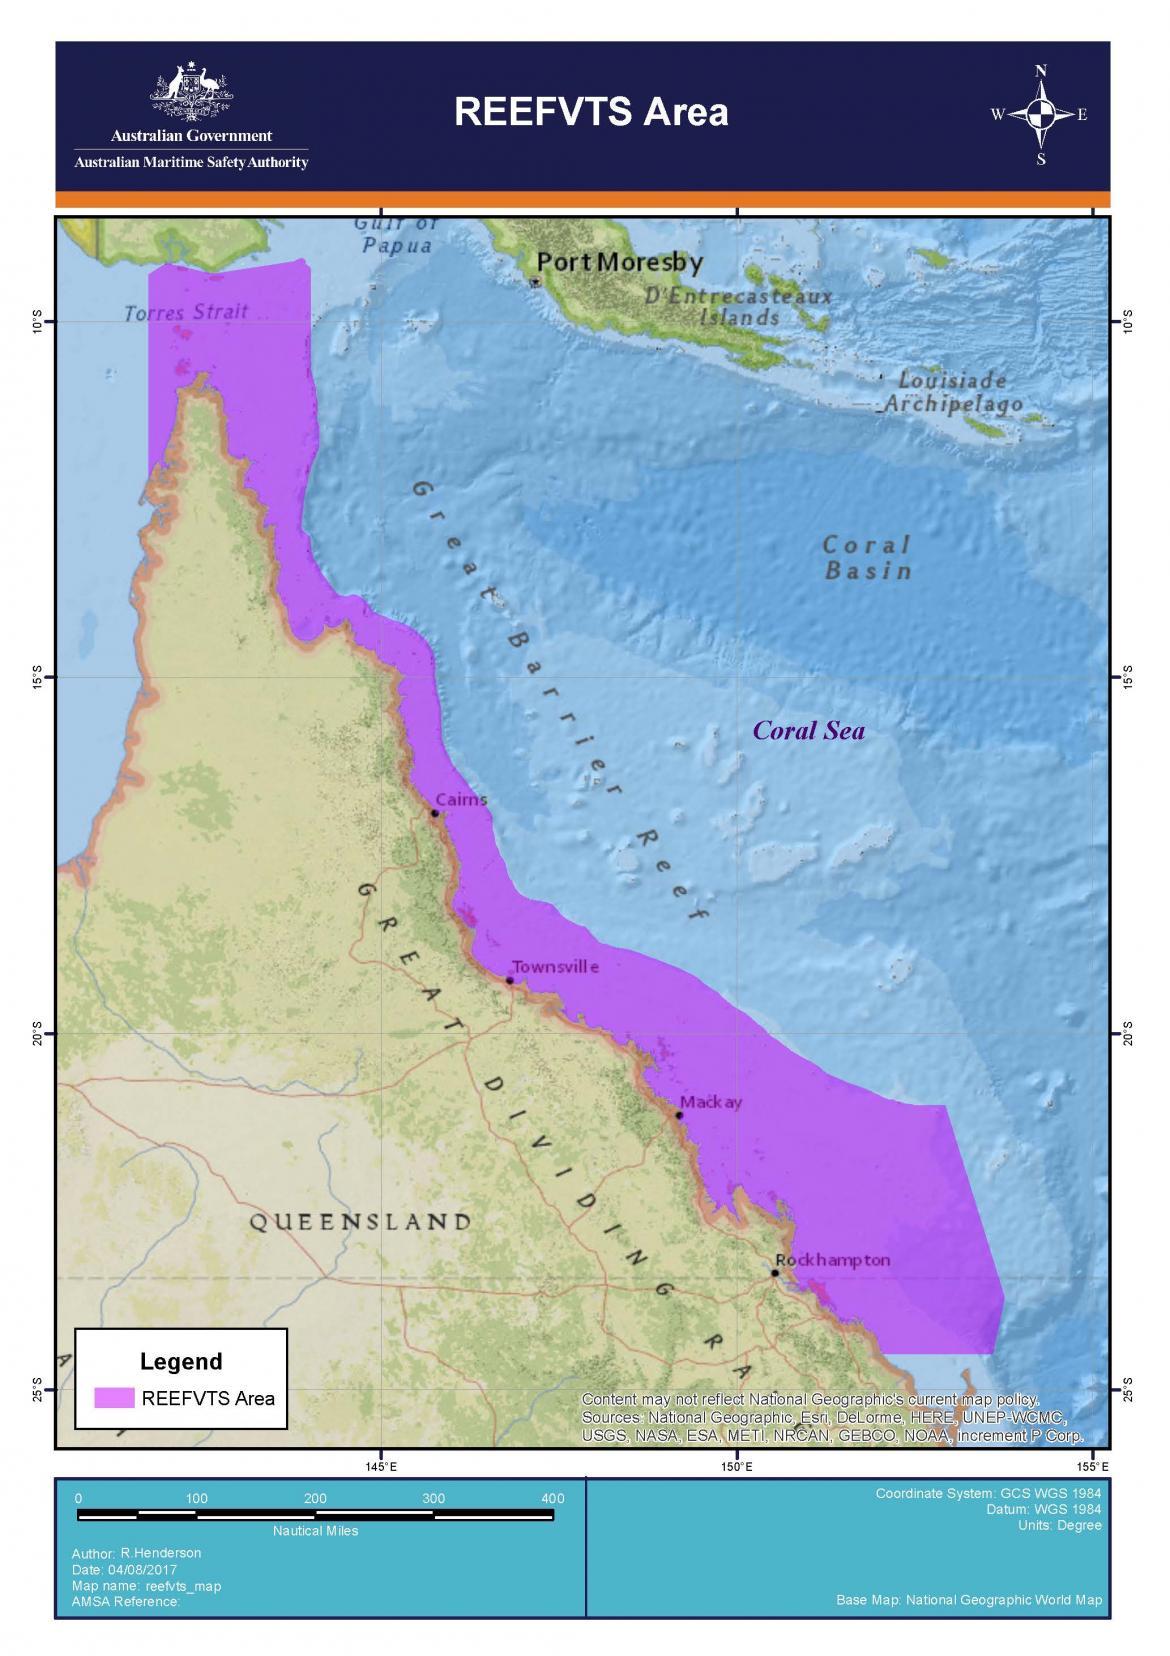 2017 8 Reefvts Map Jpg Australian Maritime Safety Authority